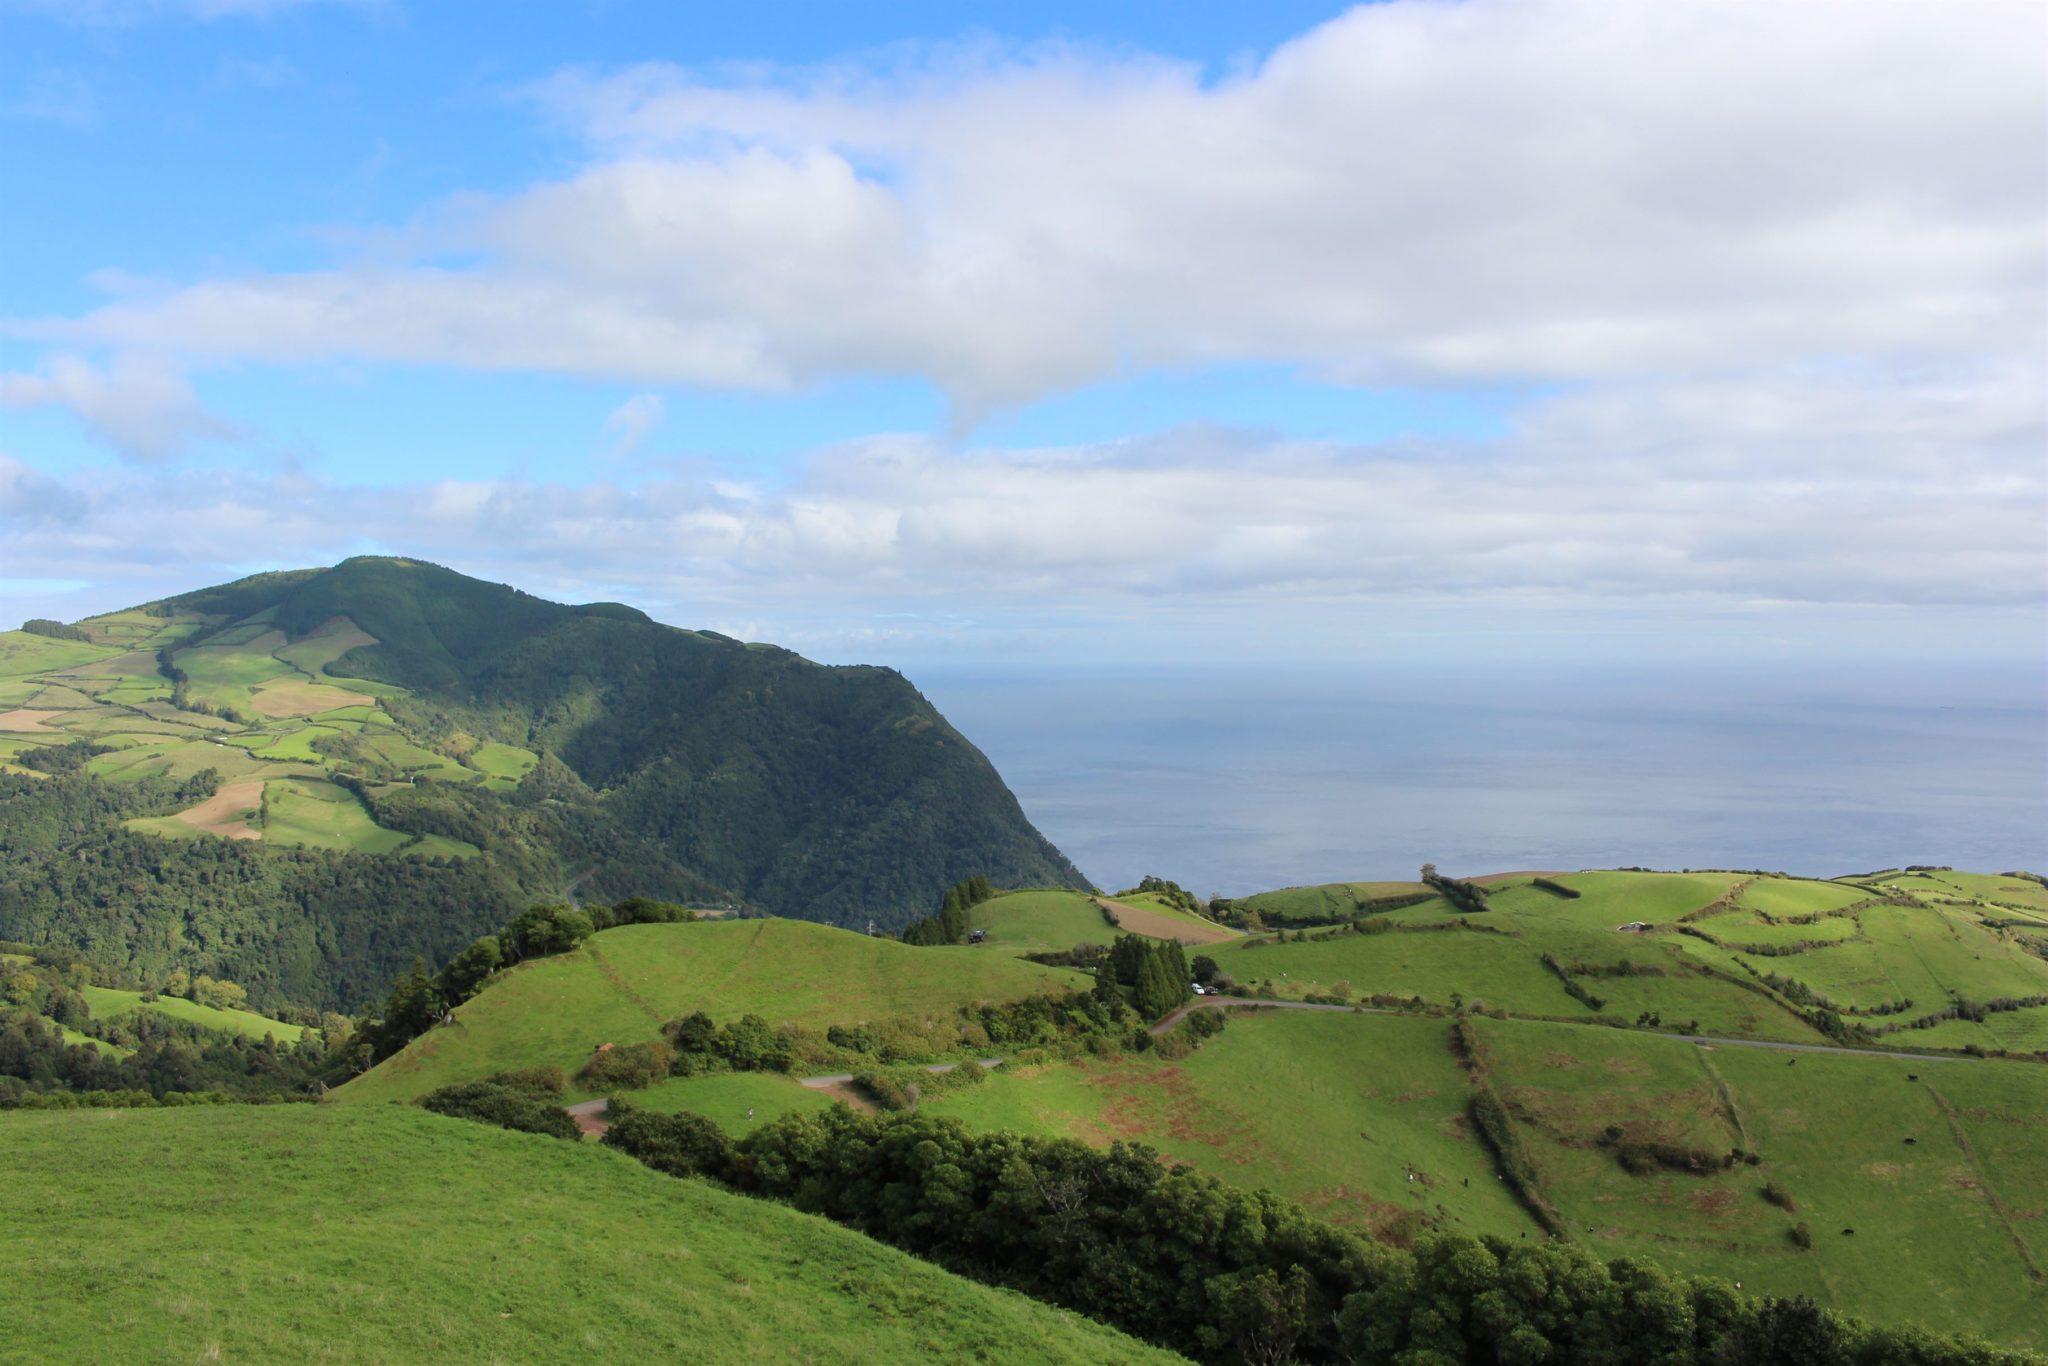 Vista a partir do Miradouro do Castelo Branco, S. Miguel, Açores